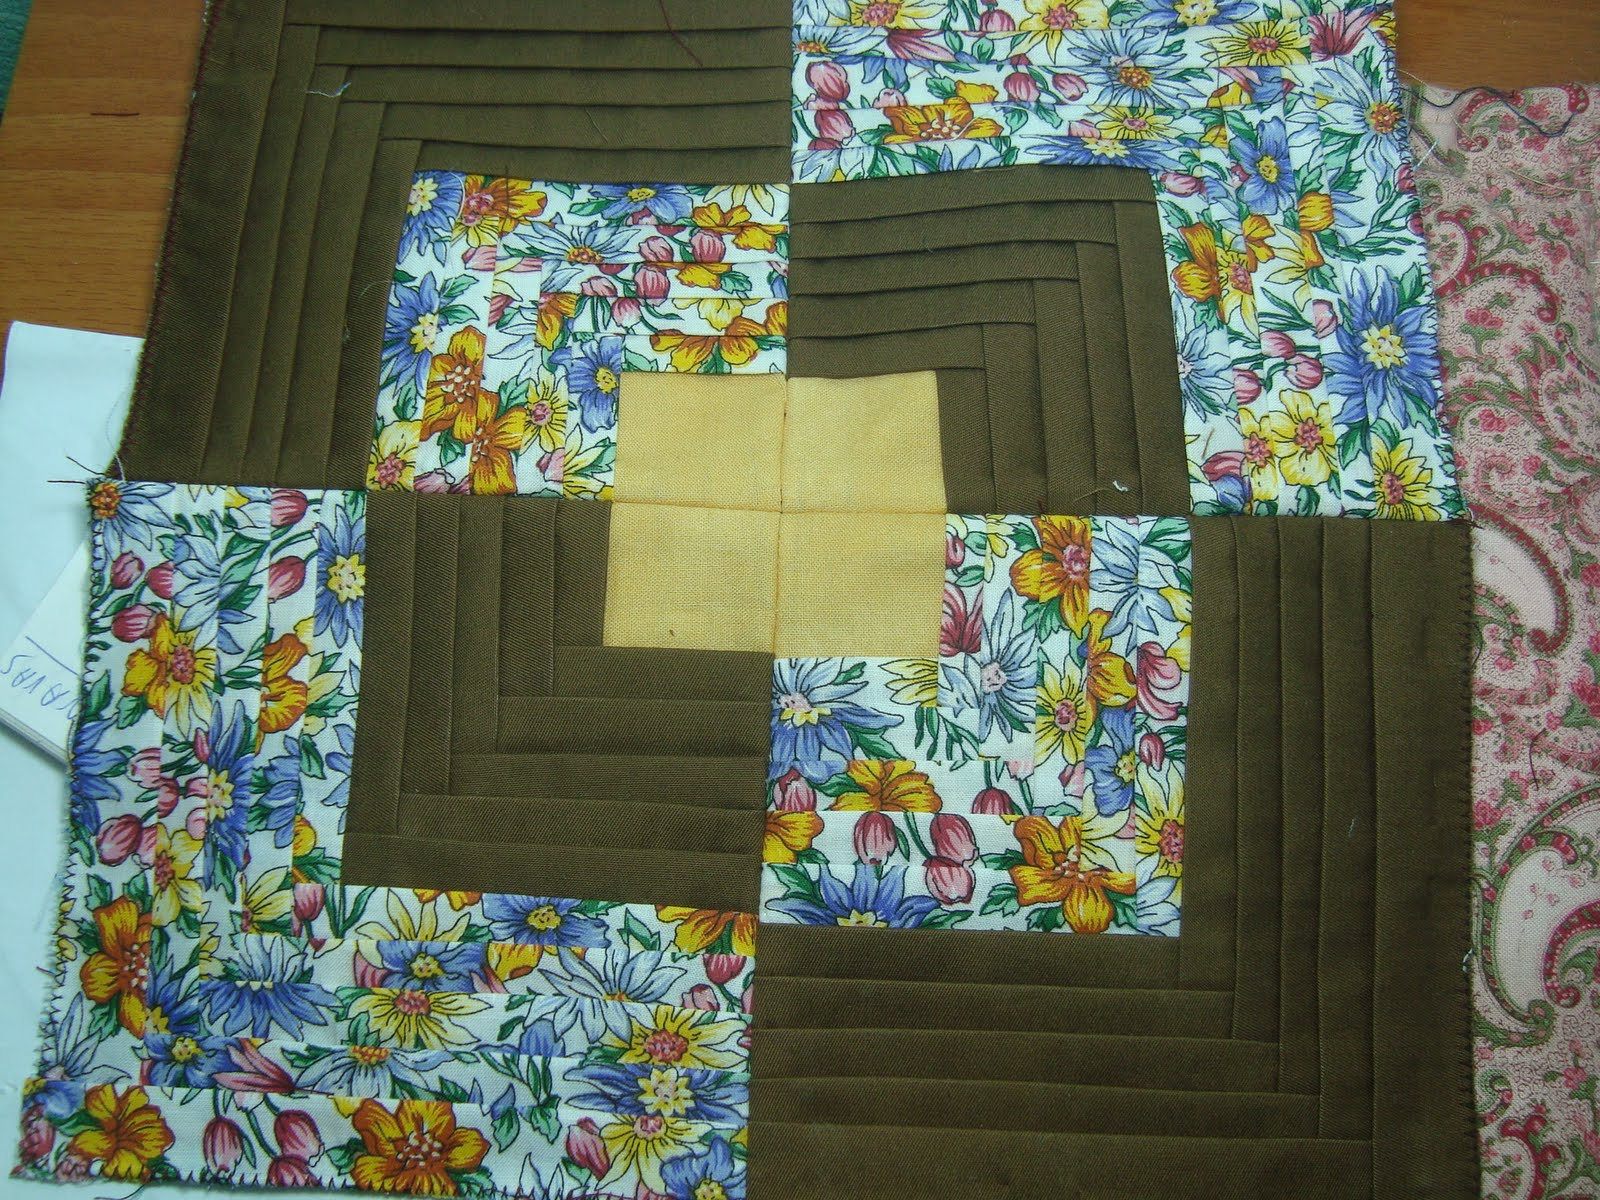 Lios de ana almazuelas 10 bloque - Almazuelas patrones gratis ...